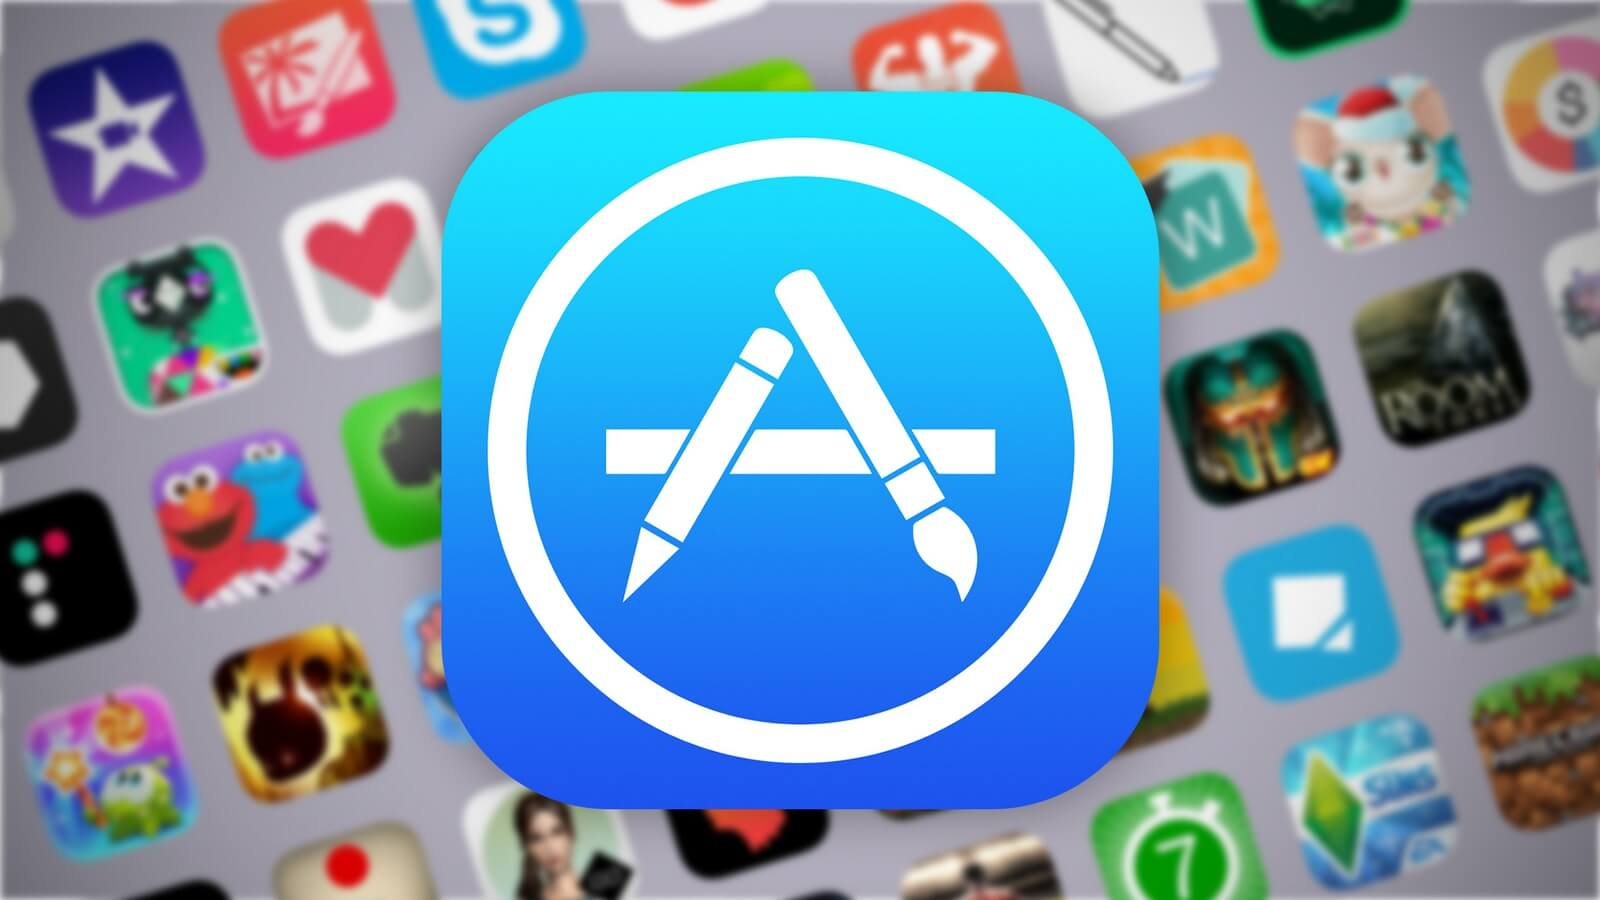 Apple เตรียมที่จะใช้คุณสมบัติการซื้อแบบครั้งเดียวสำหรับทุกแพลตฟอร์ม